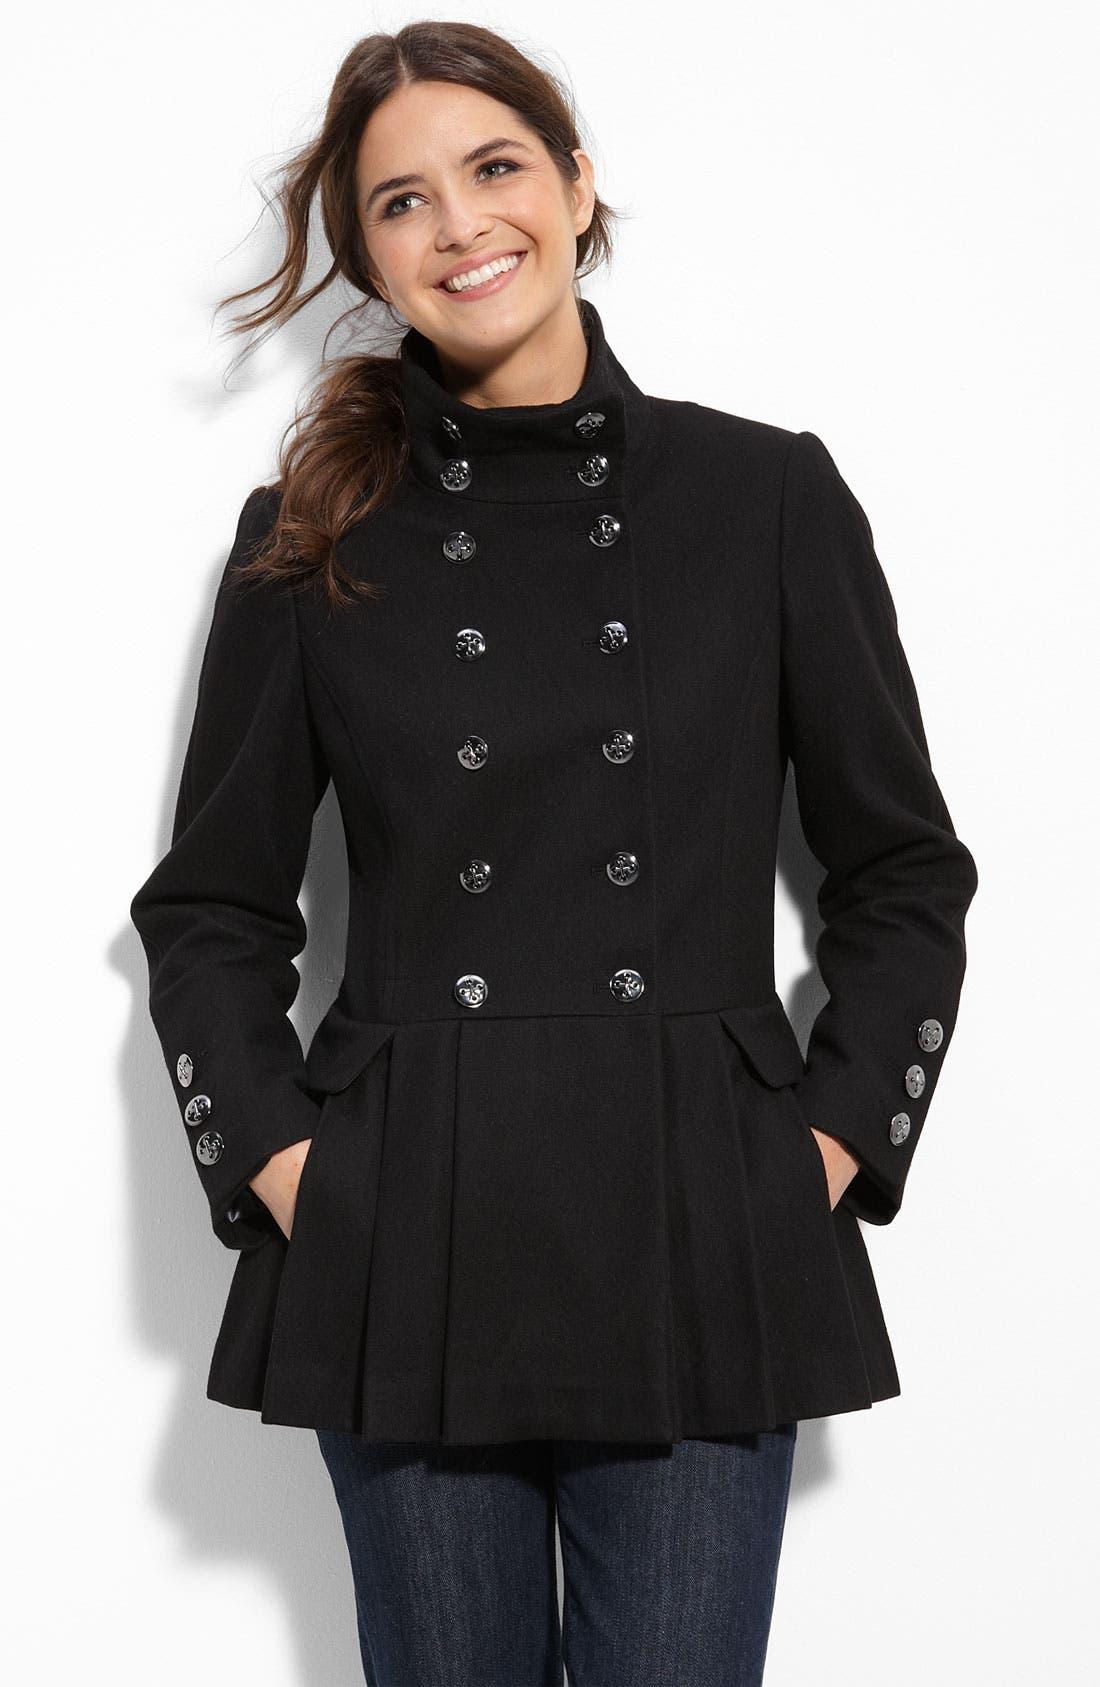 Main Image - Calvin Klein Military Inspired Wool Blend Coat